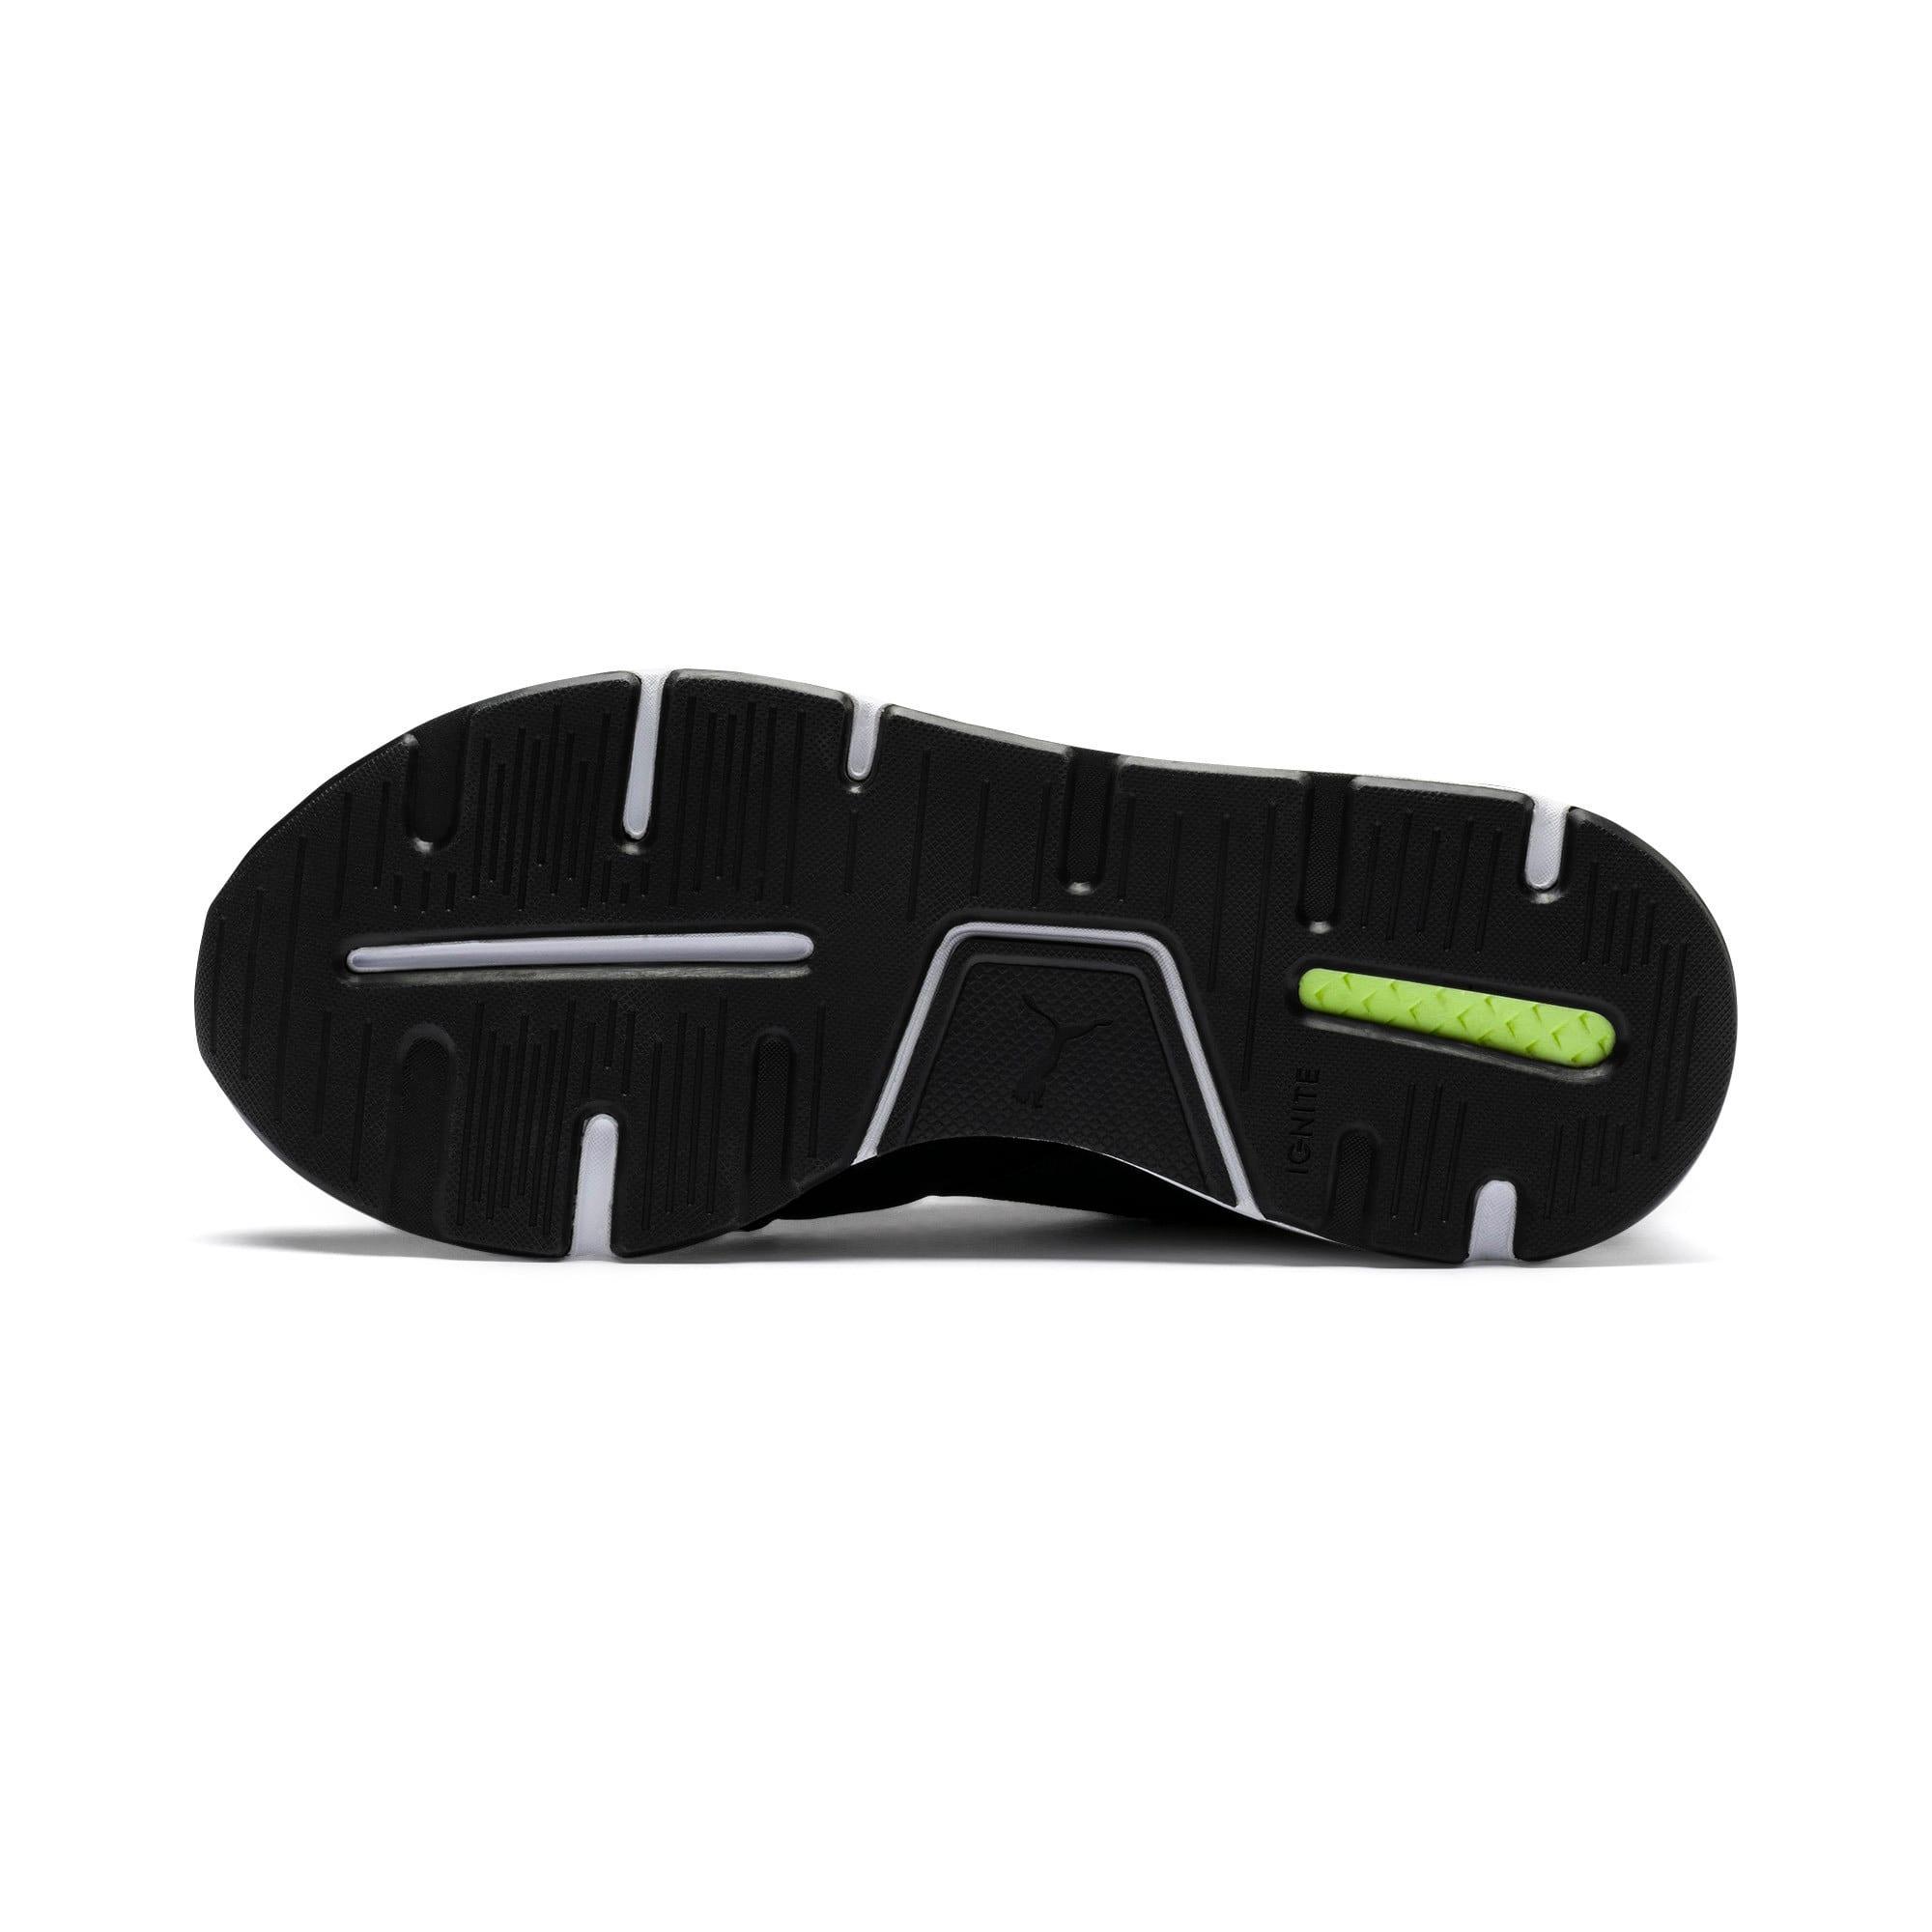 Thumbnail 4 of En Pointe Muse Satin Women's Sneakers, Puma Black-Puma White, medium